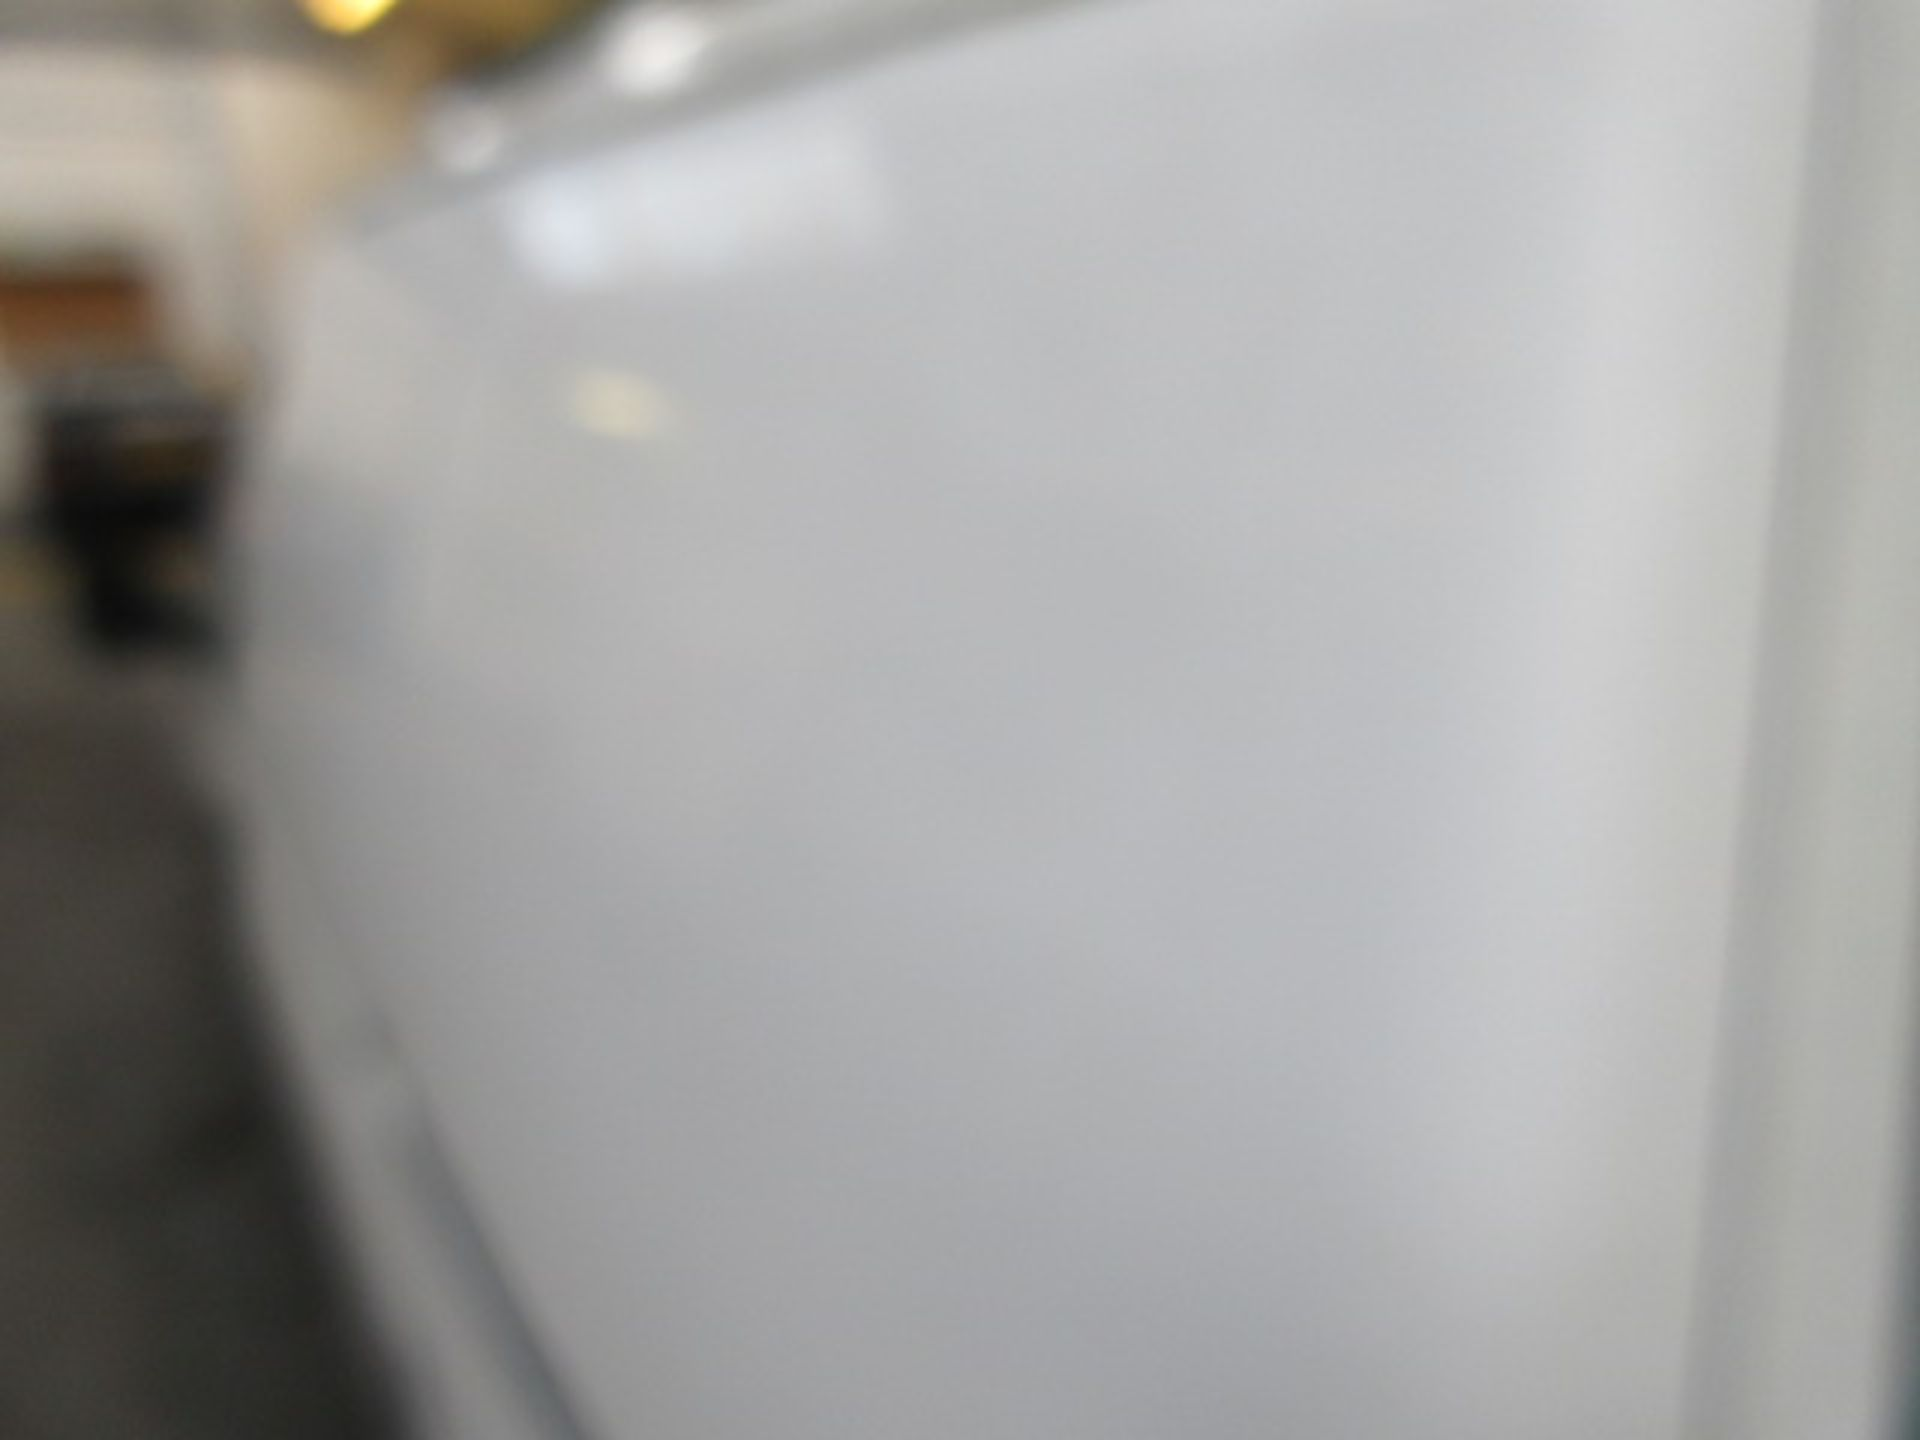 54 05 Peugeot Expert 815D - Image 7 of 15